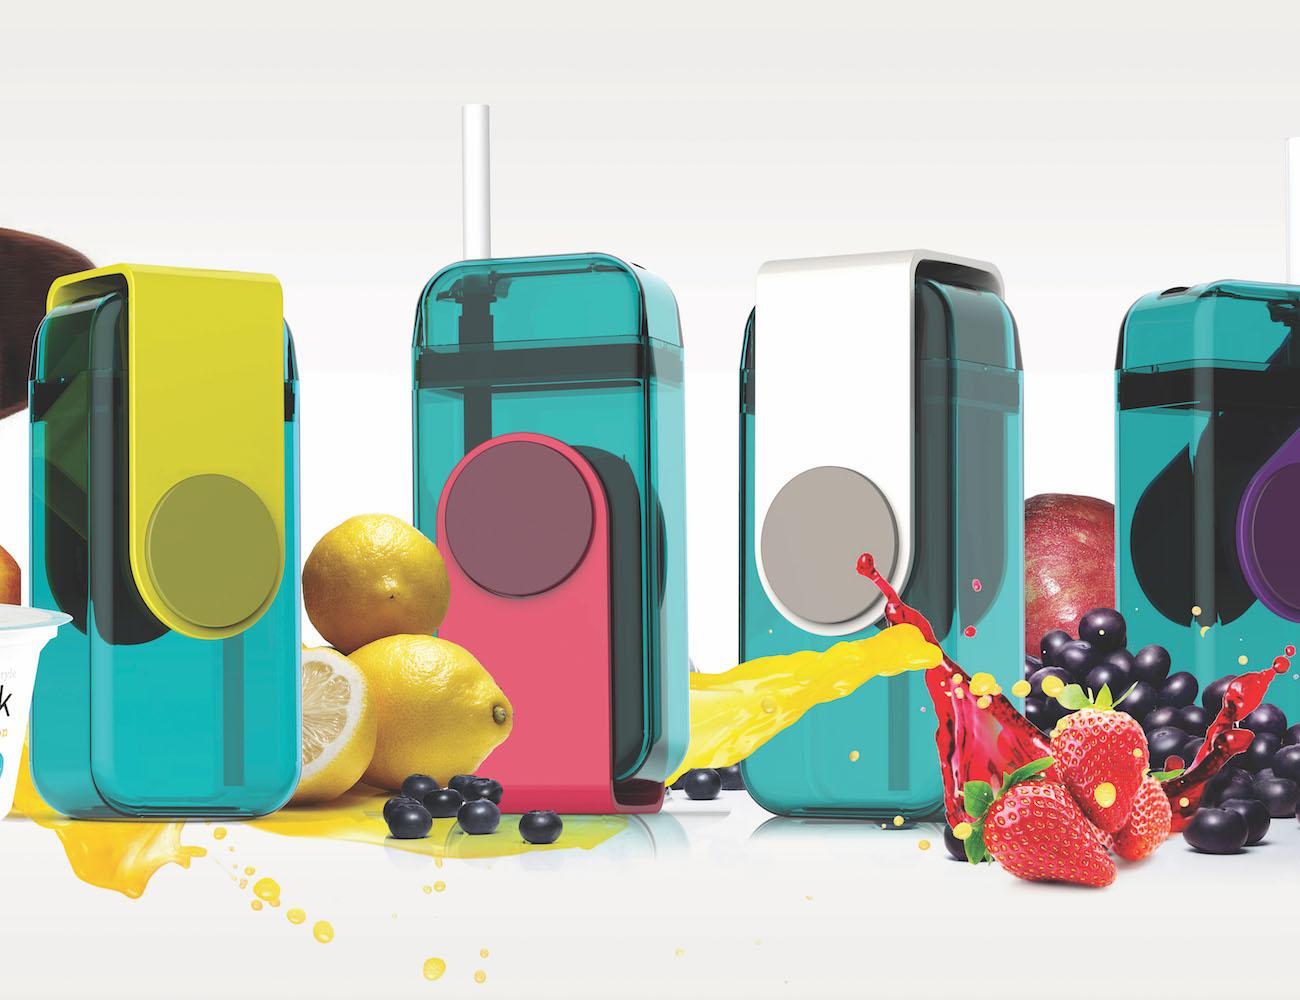 the-juicy-drink-box-04